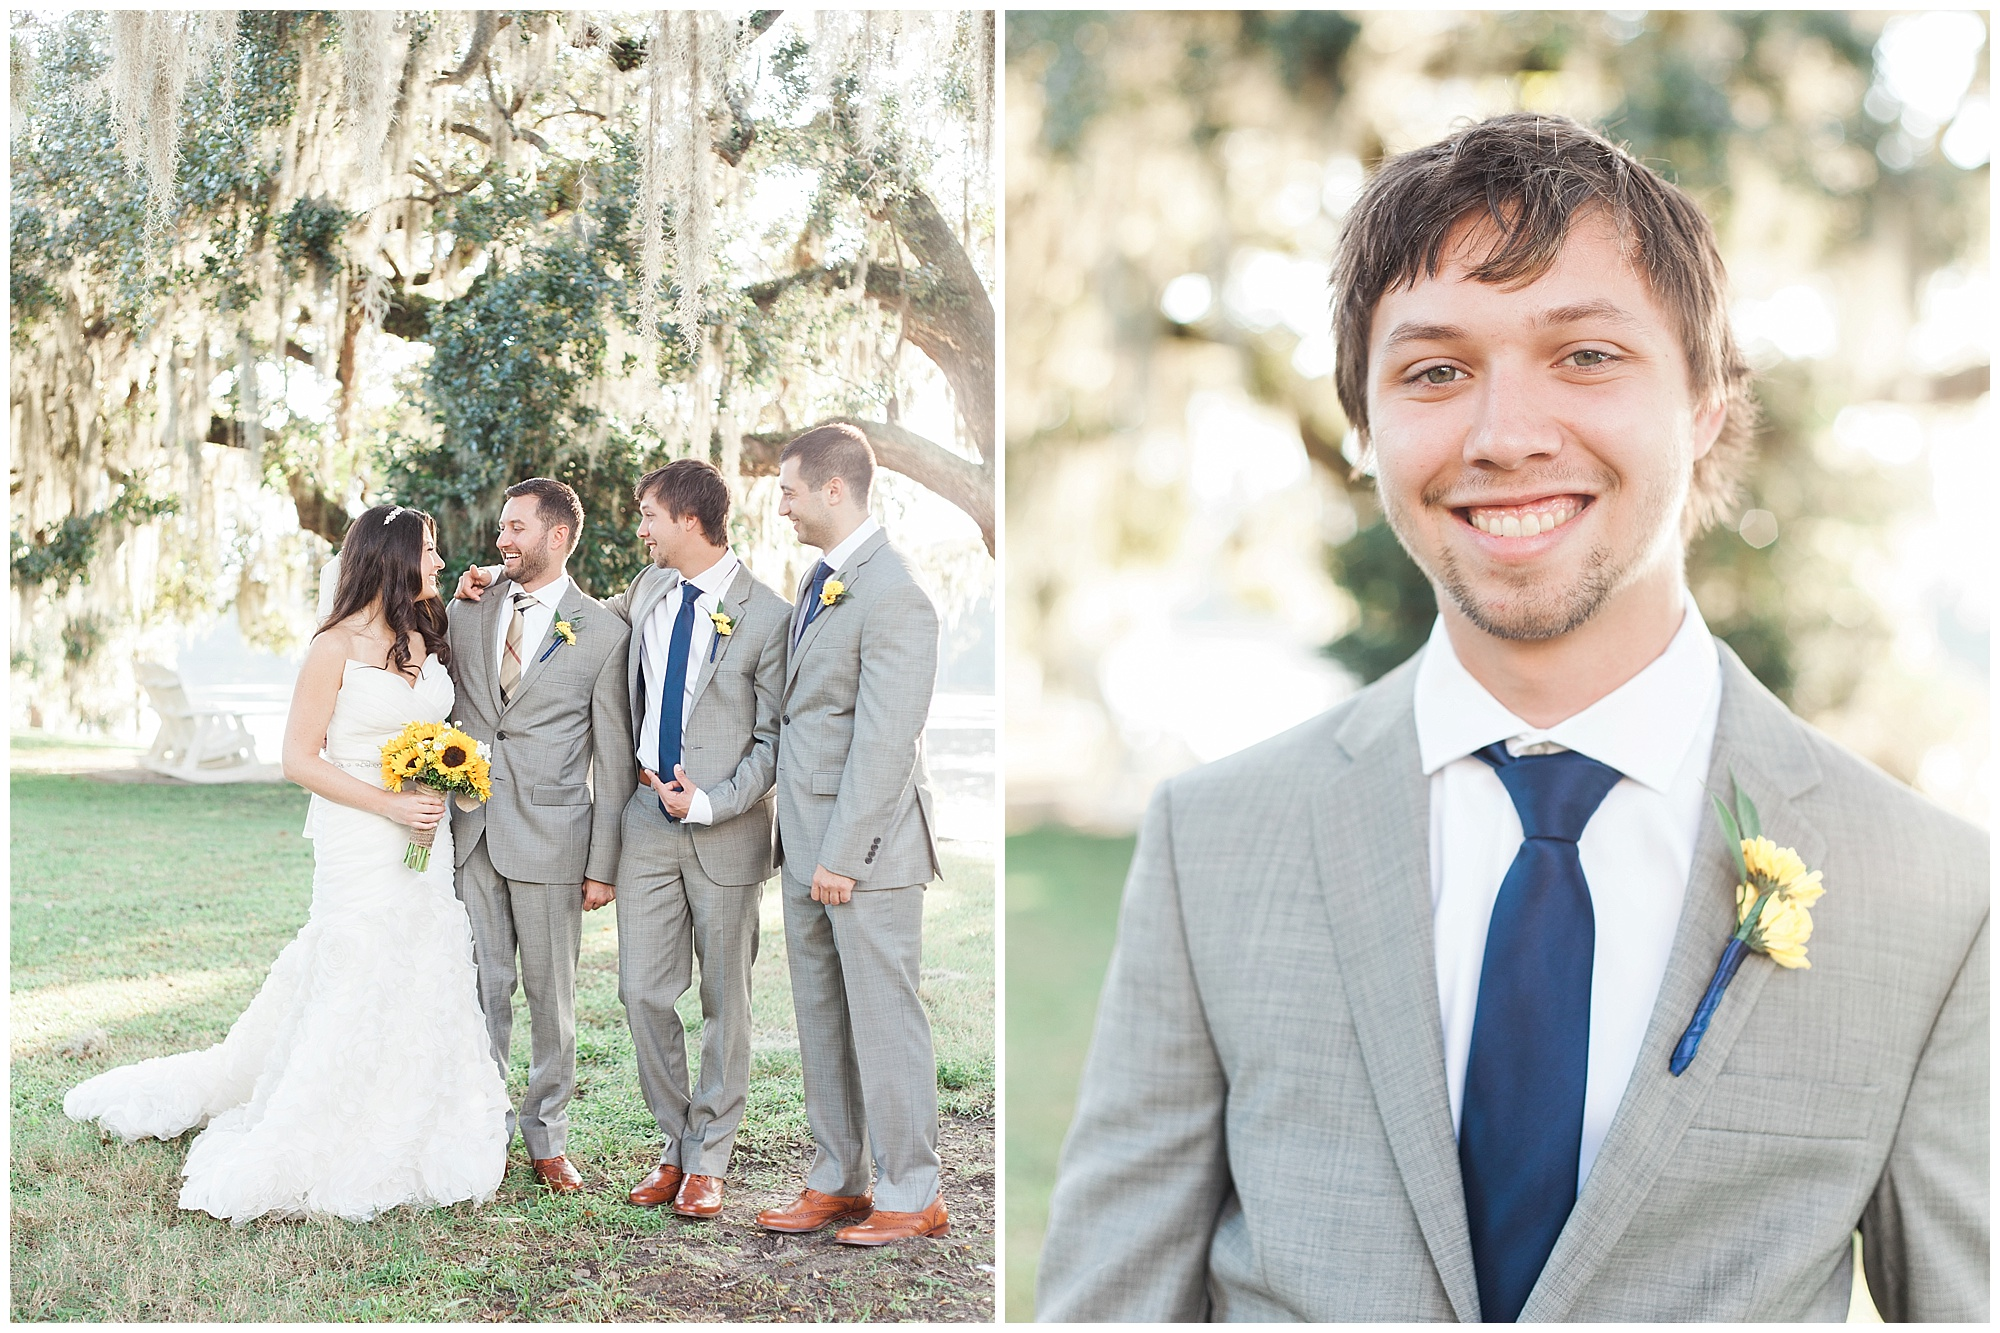 Carolina Wedding Photographer   Wynona Benson Photography   Arielle & Bobby